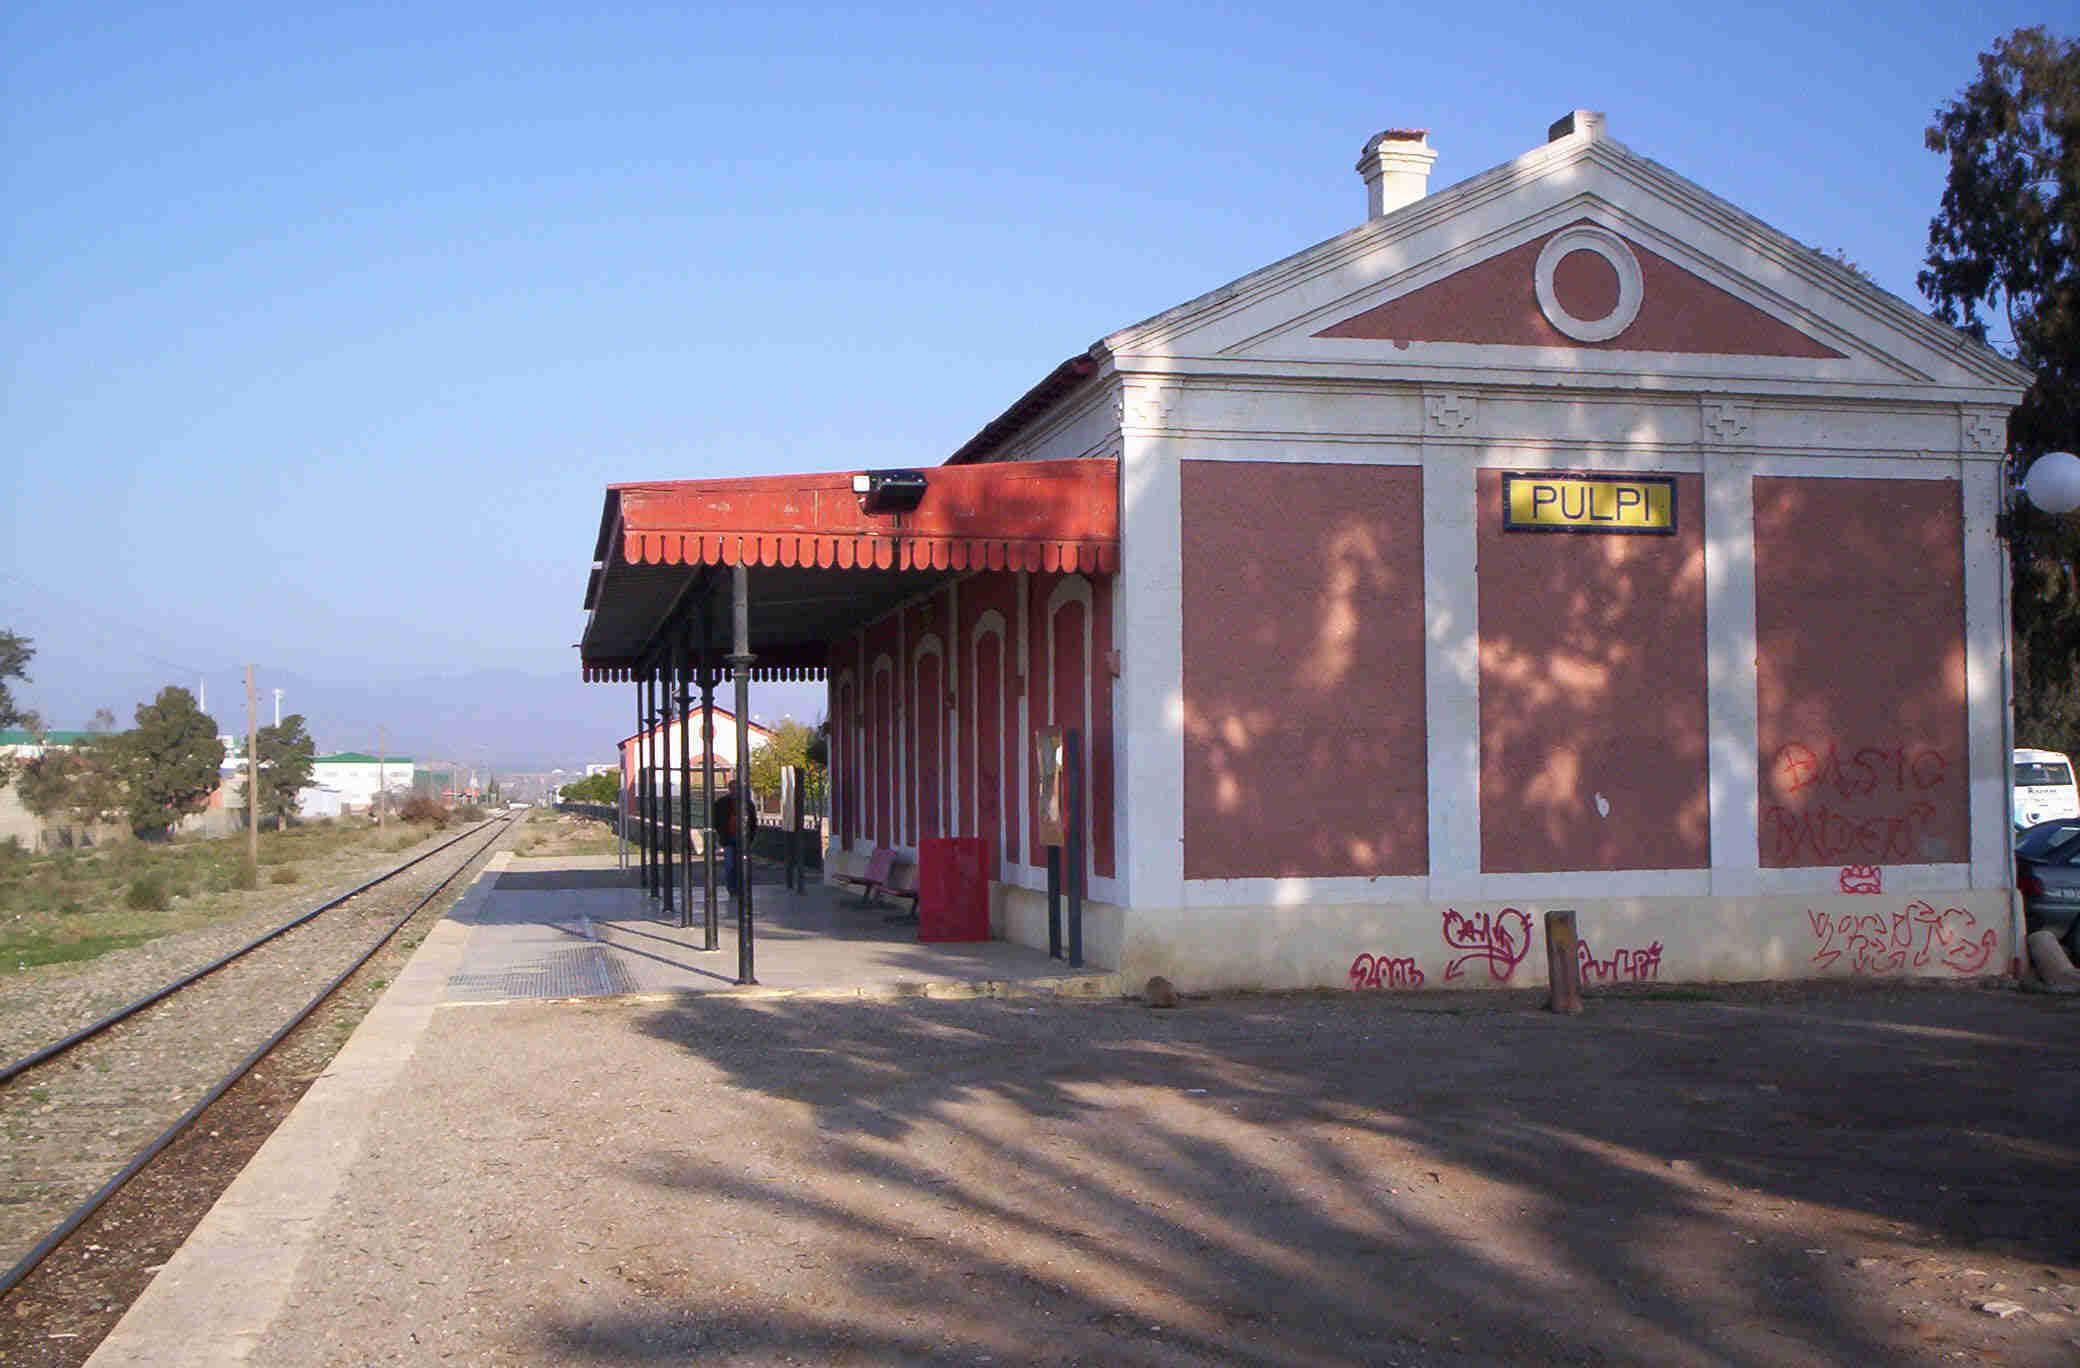 estacion-de-pulpi-enero-del-2006